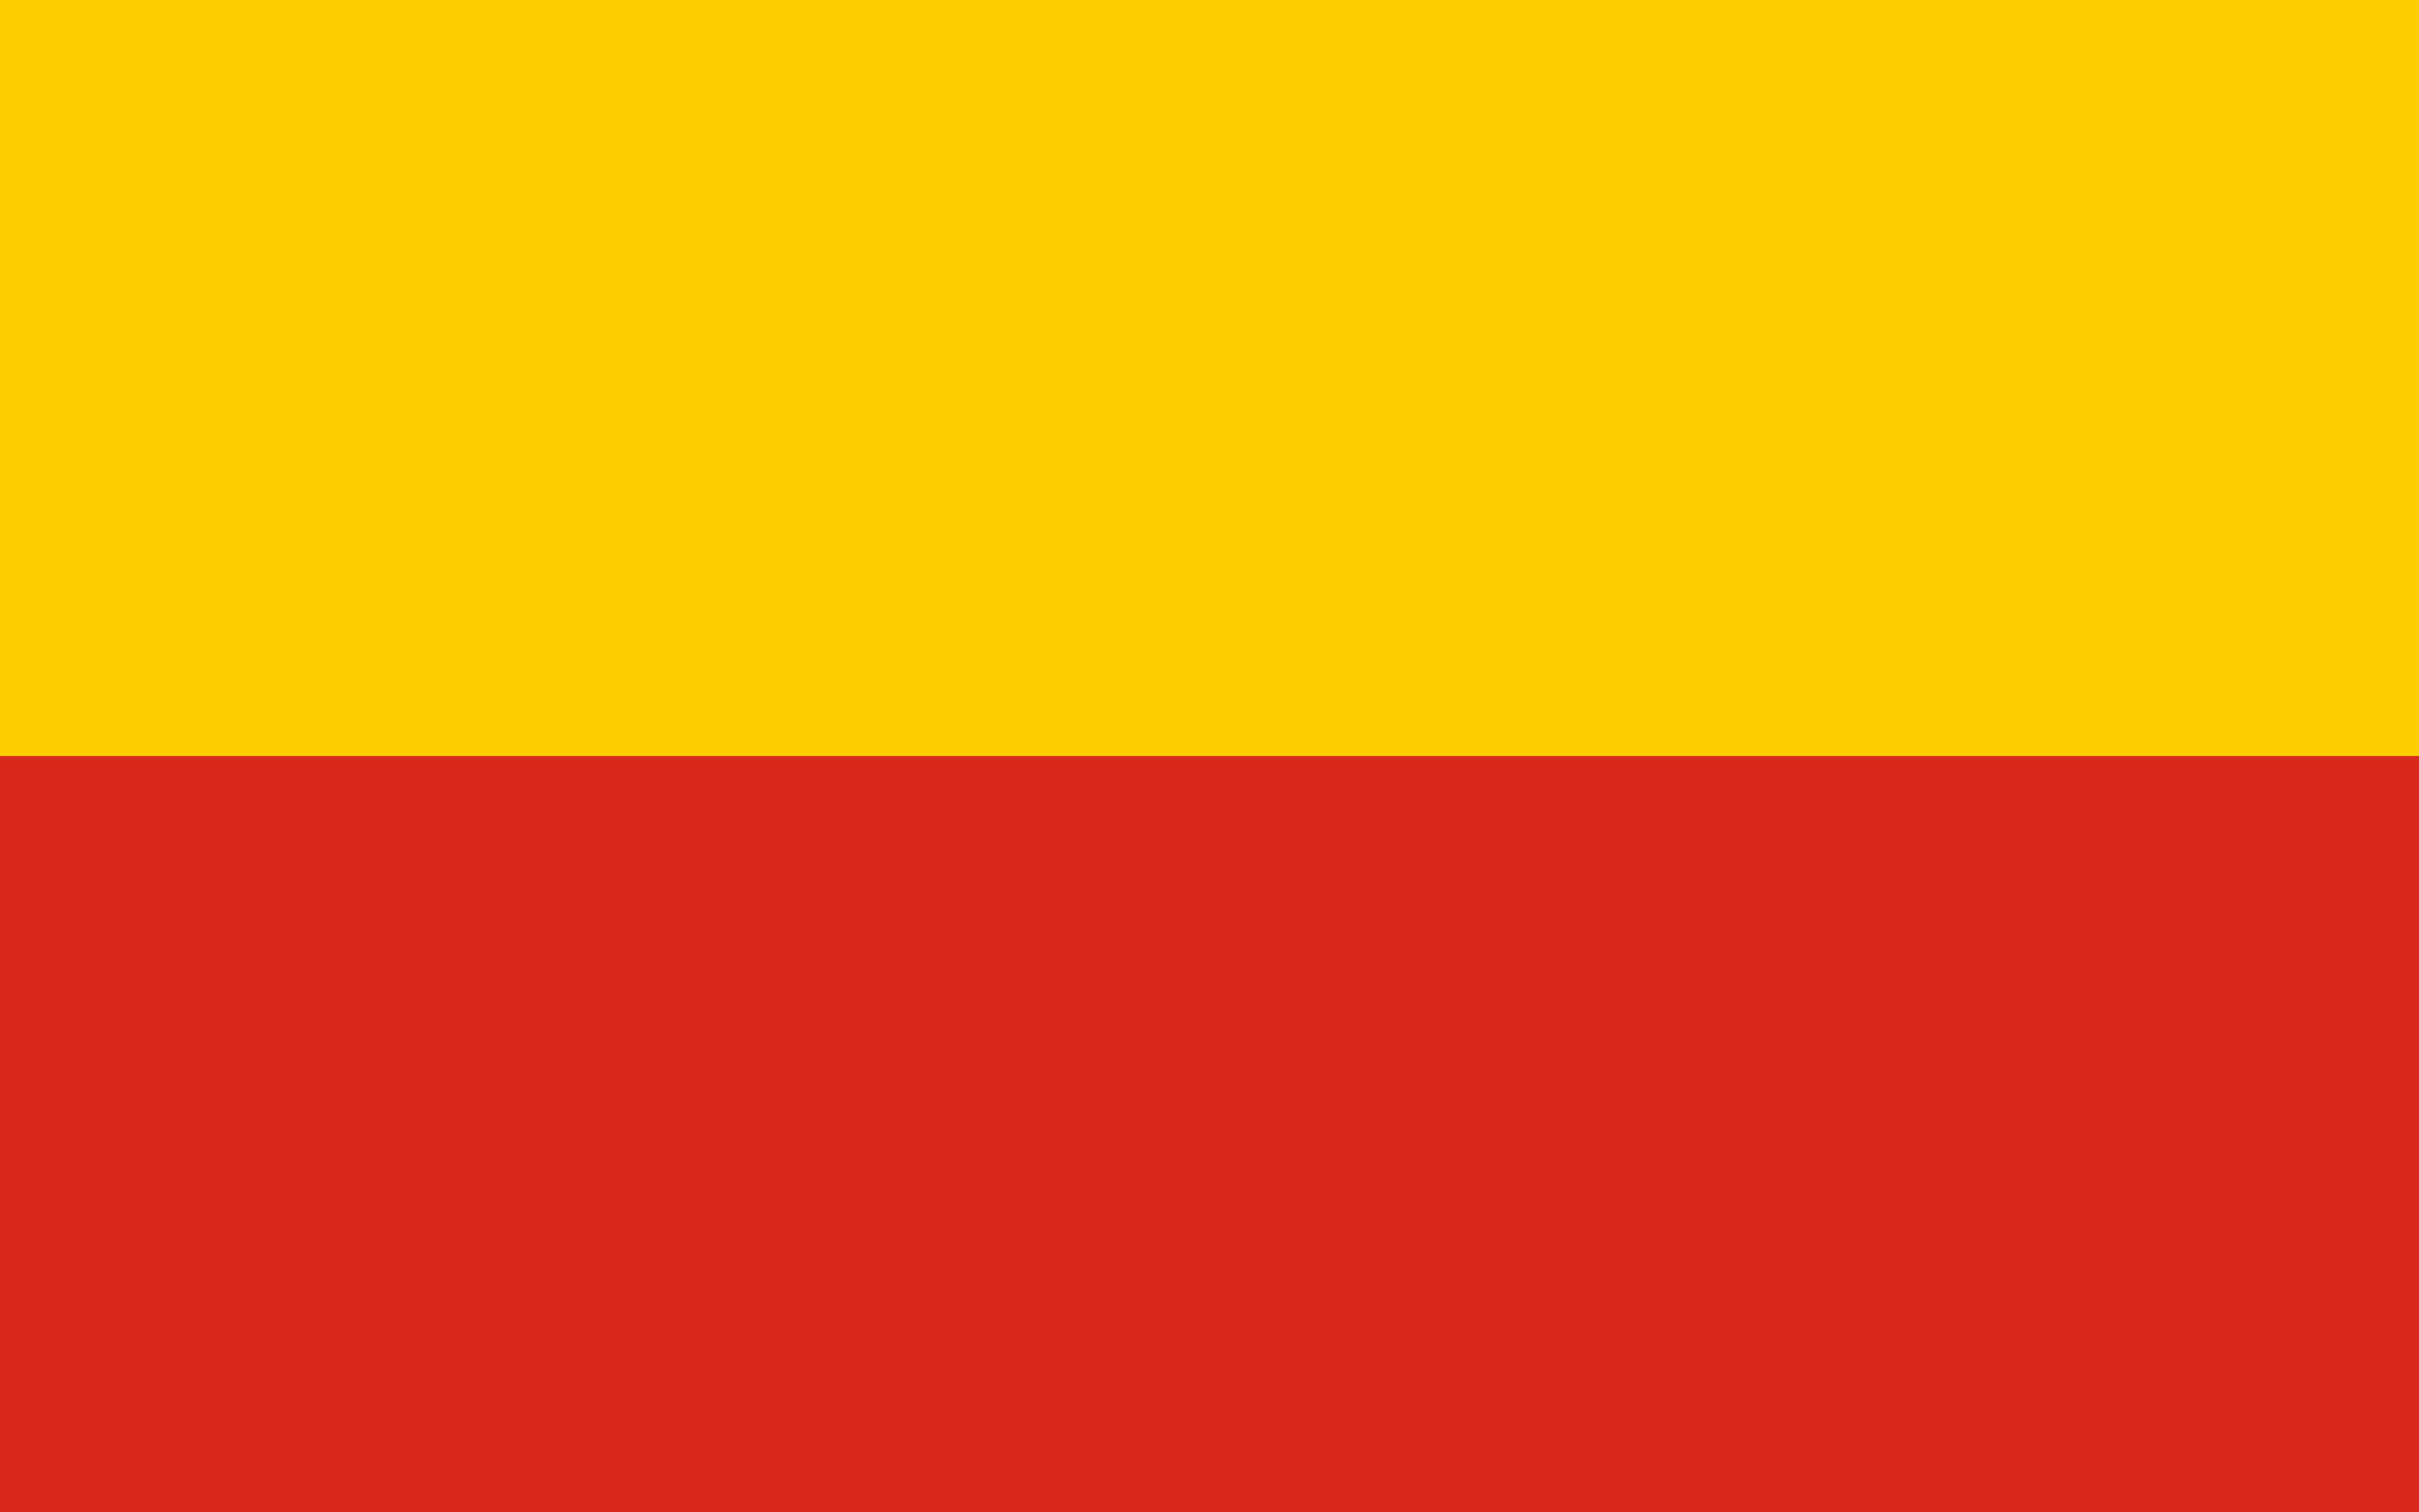 Flag_of_Warsaw